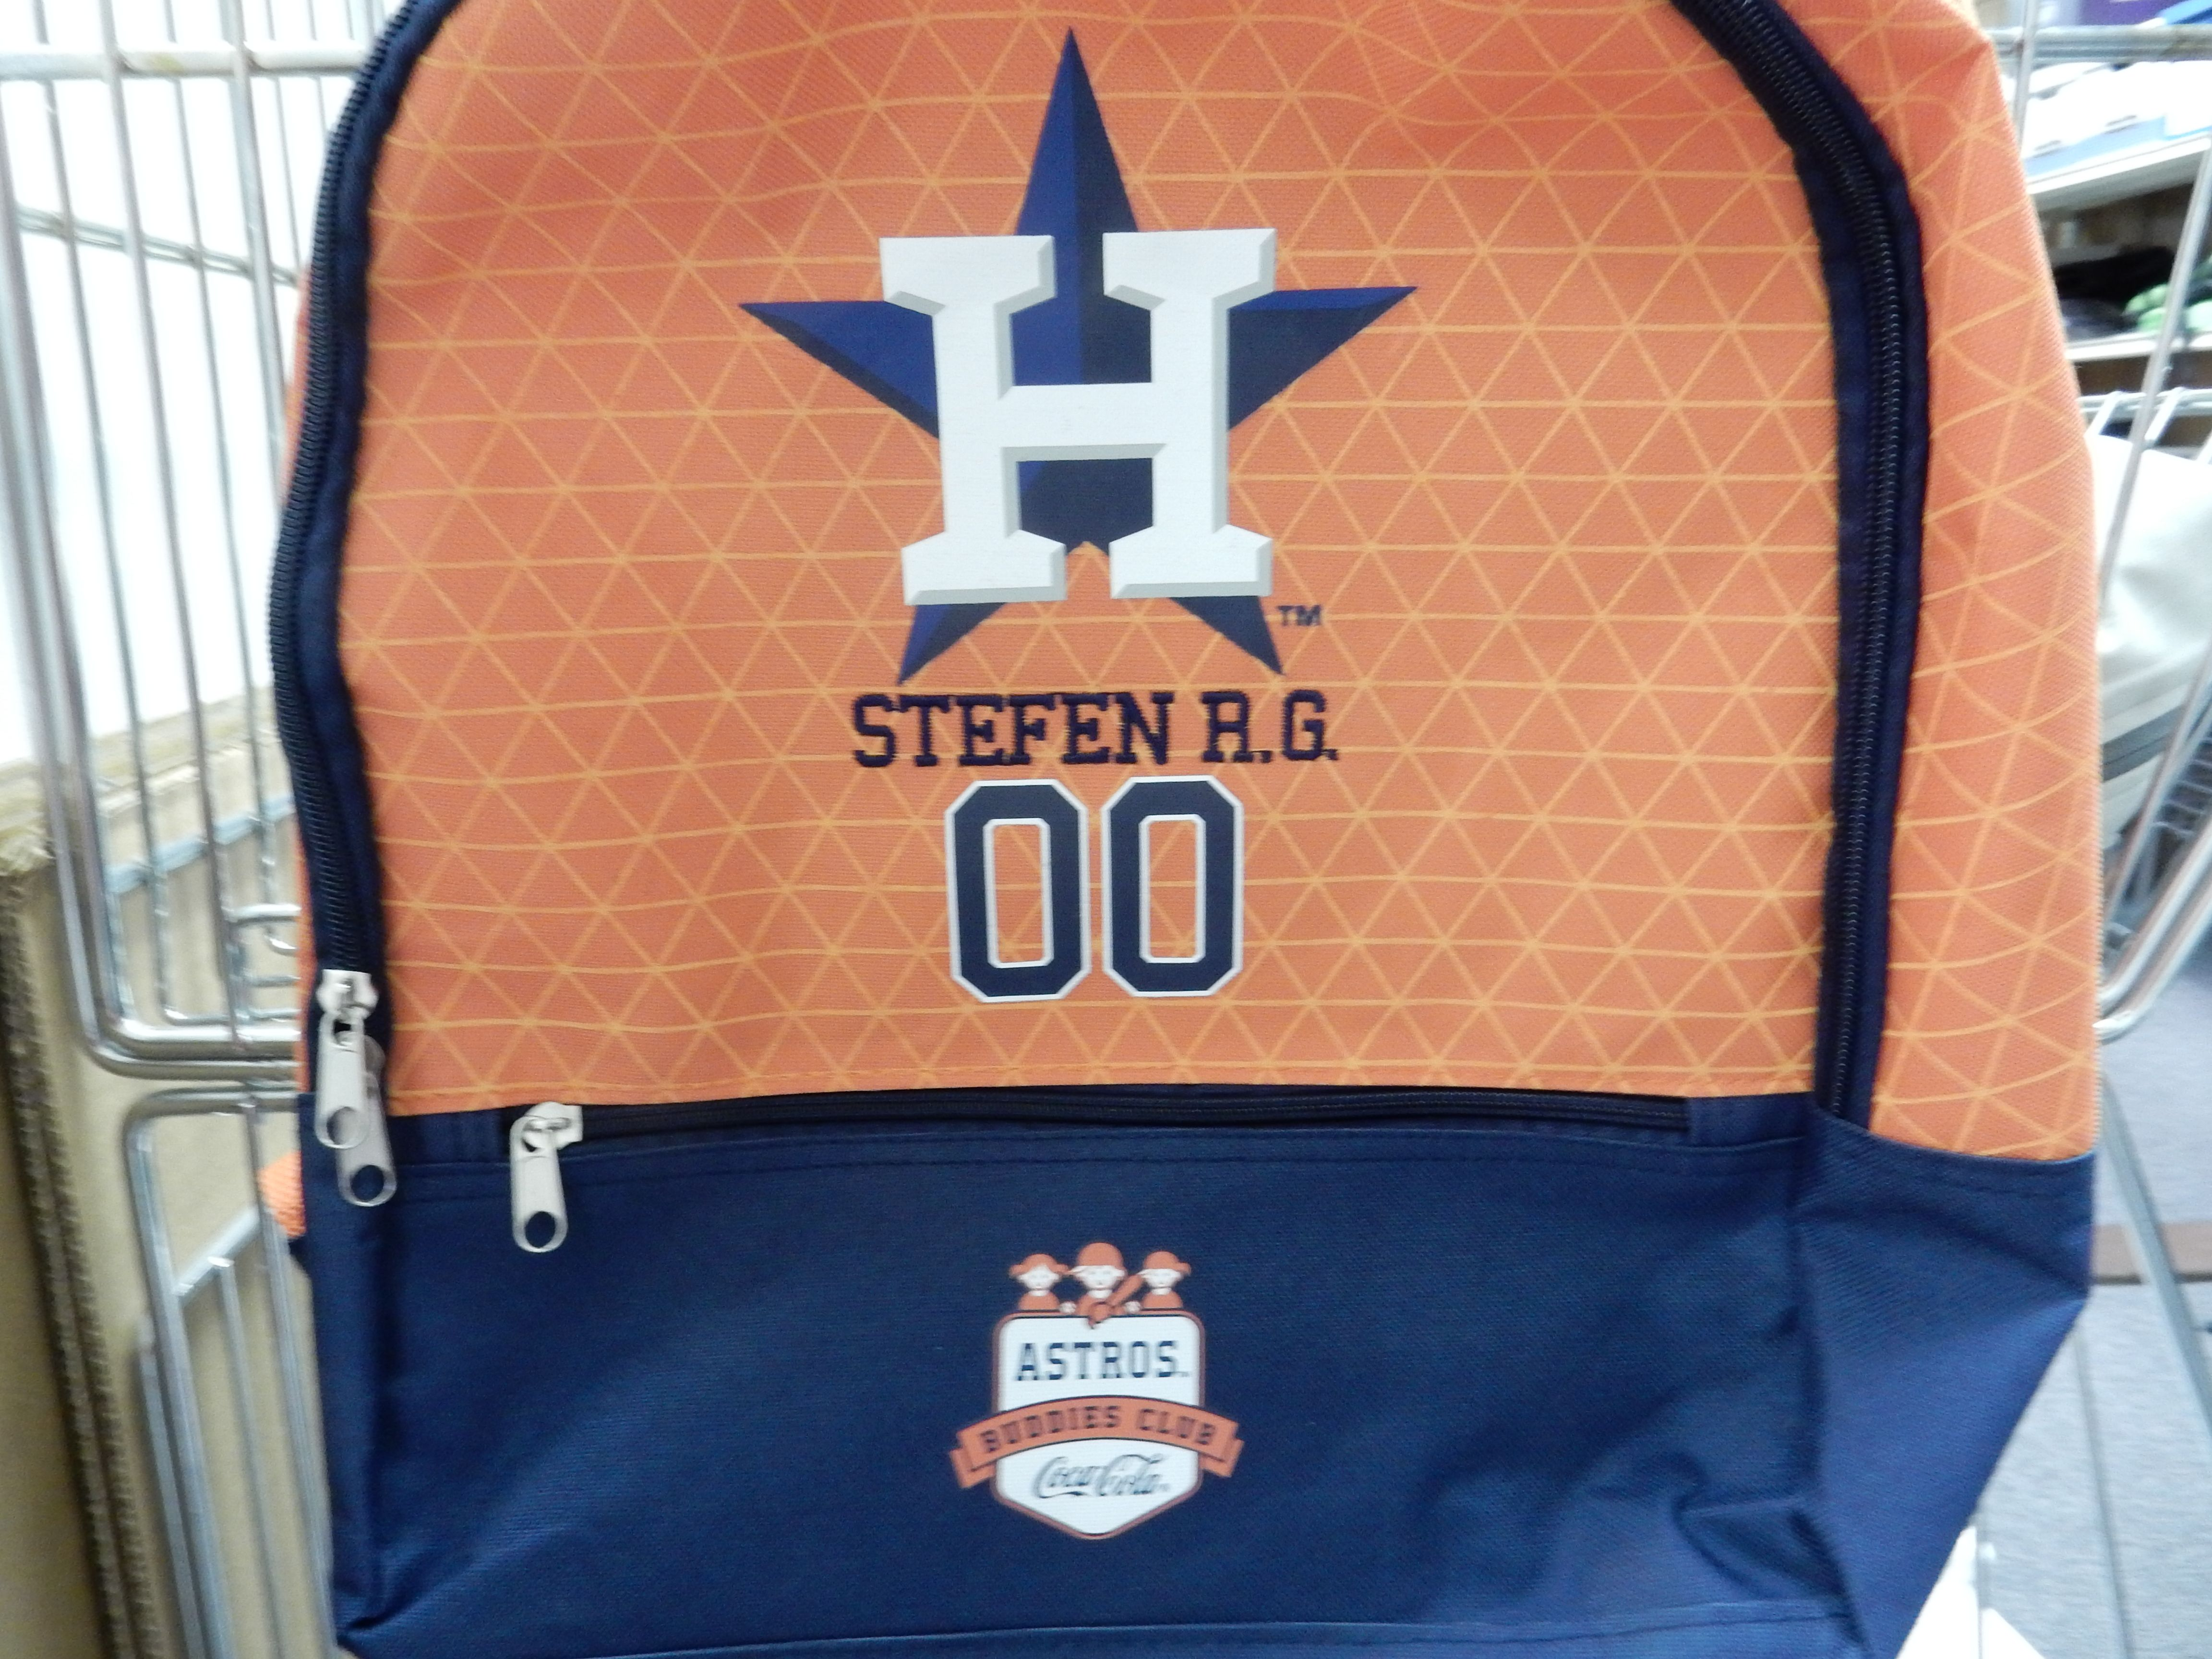 Personalized Backpack Personalized backpack, Backpacks